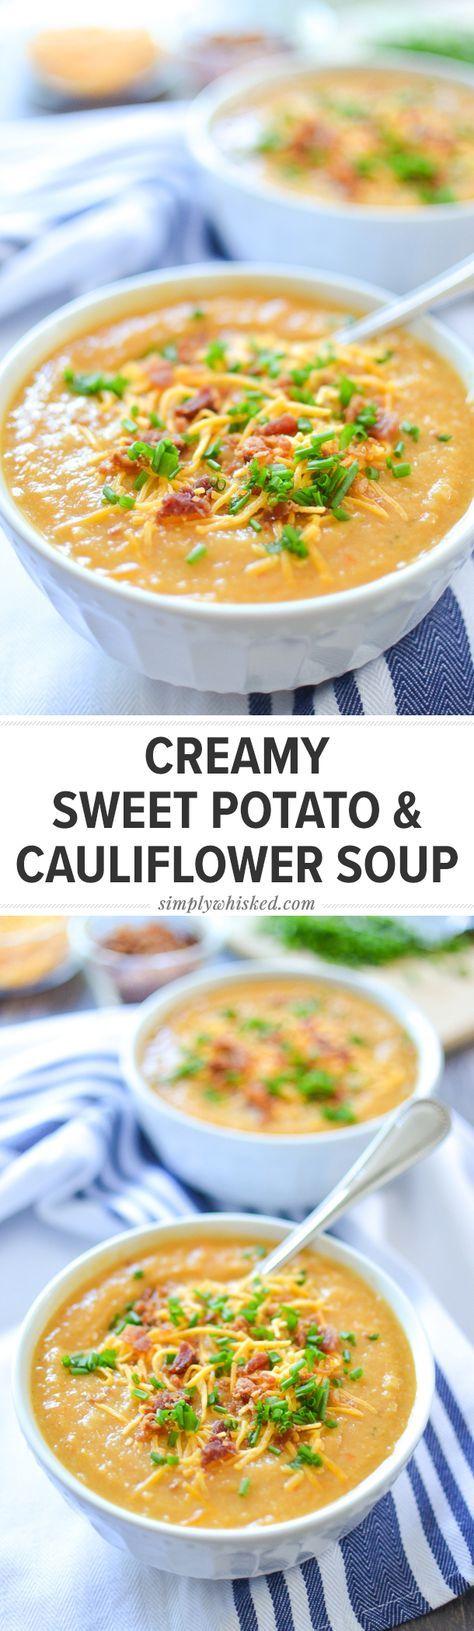 Creamy Sweet Potato & Cauliflower Soup | @simplywhisked